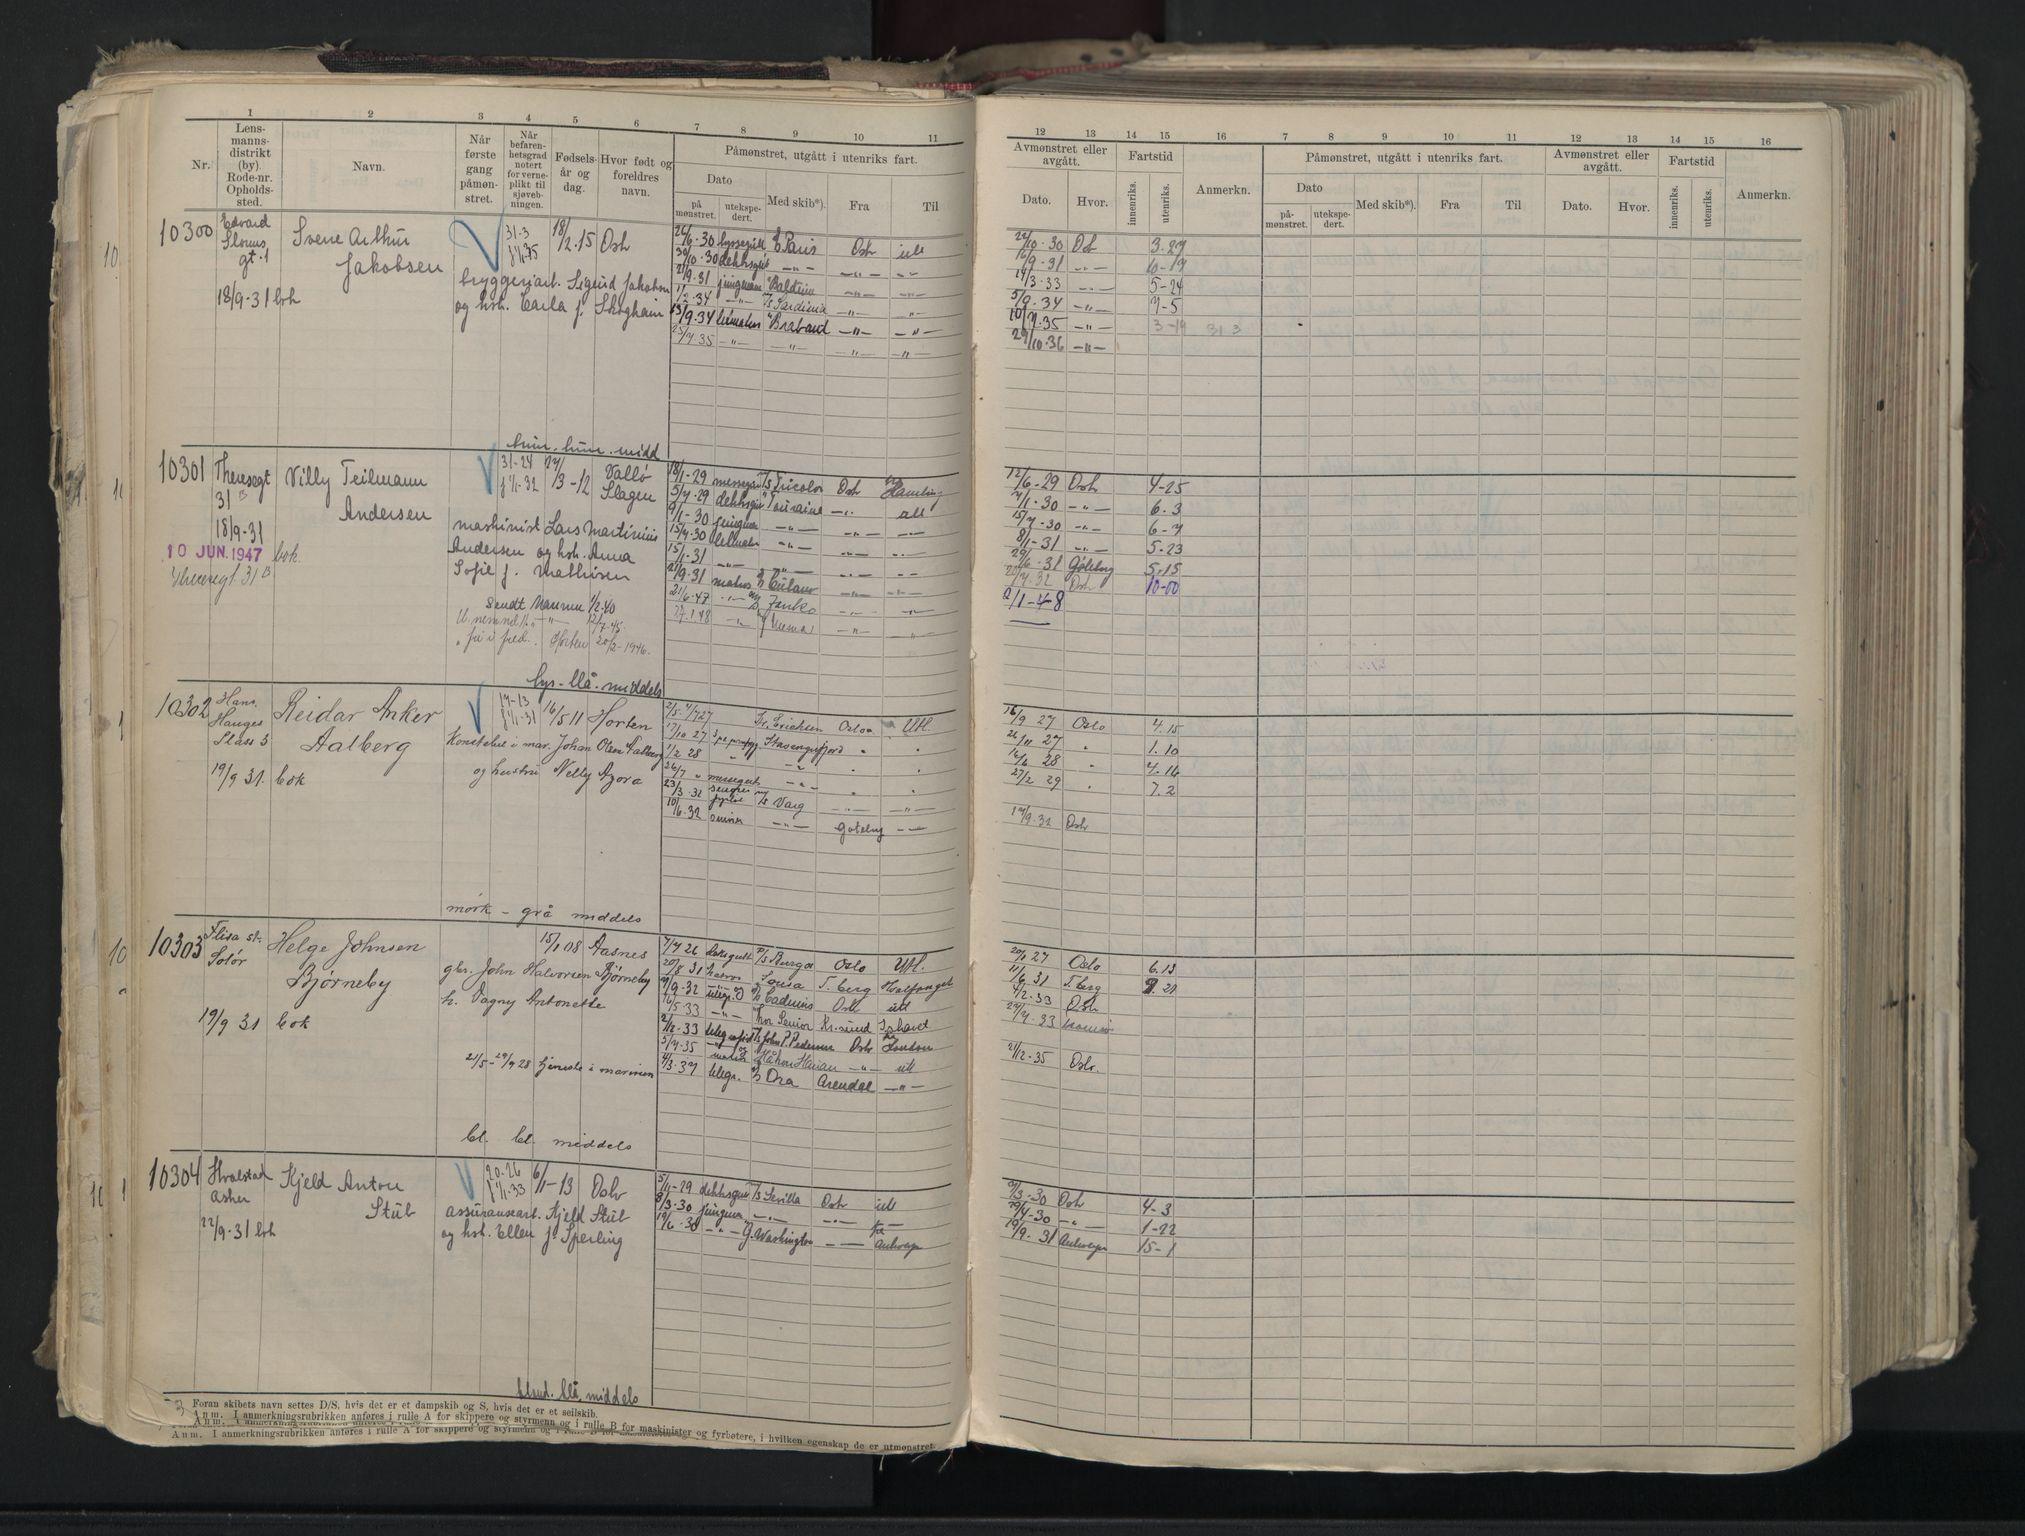 SAO, Oslo sjømannskontor, F/Fc/L0007: Hovedrulle, 1930-1948, s. 57